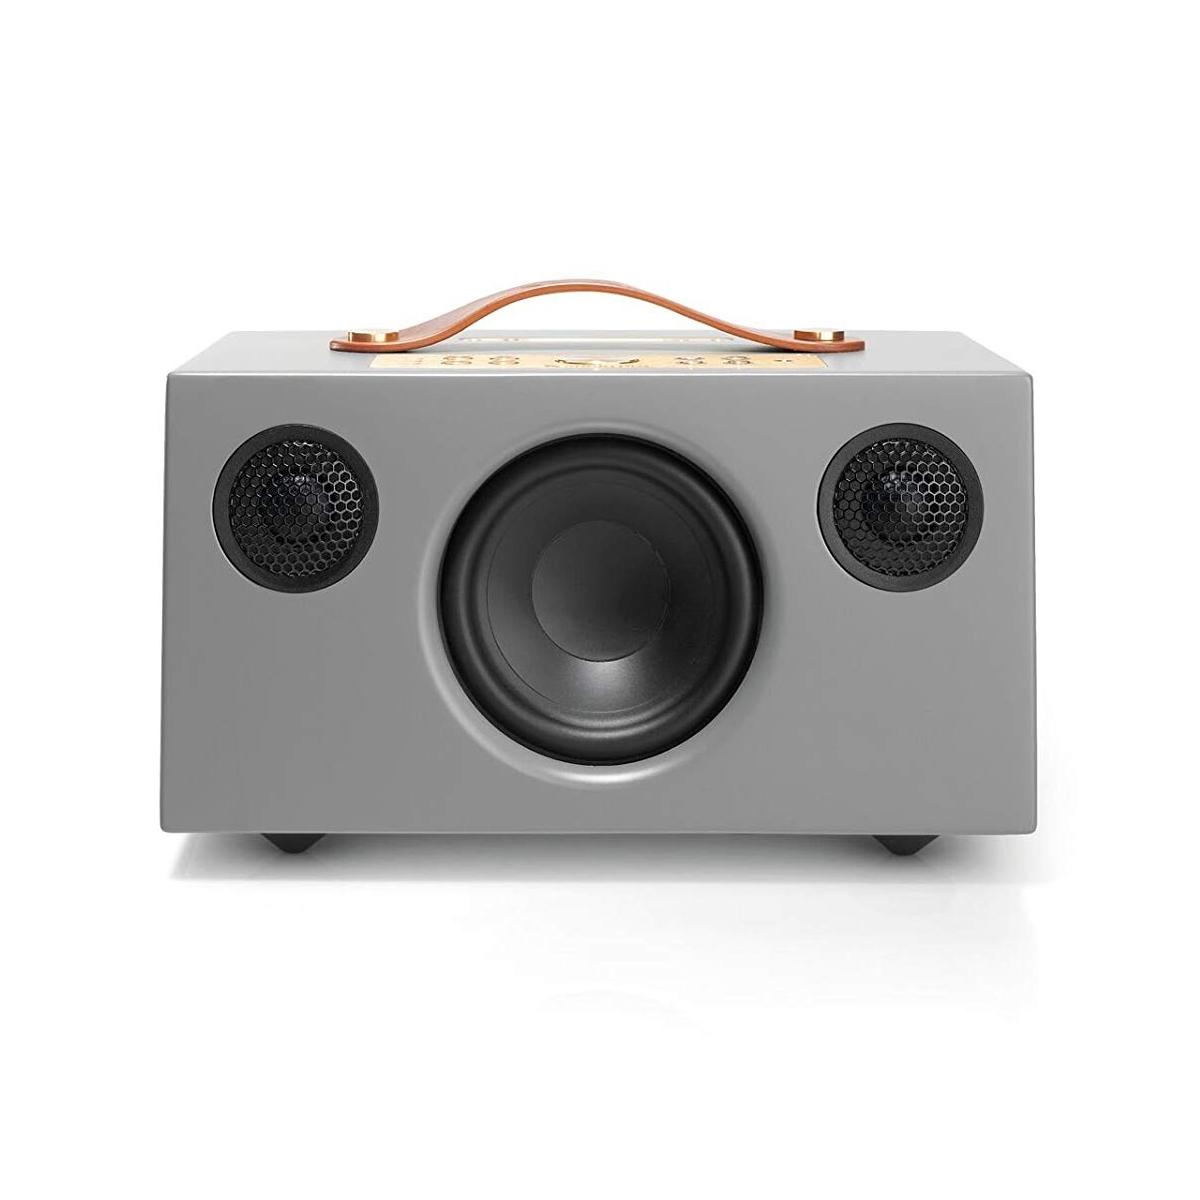 Image of Audio Pro Addon C5A Wireless Multiroom Smart Speaker with Alexa in Grey